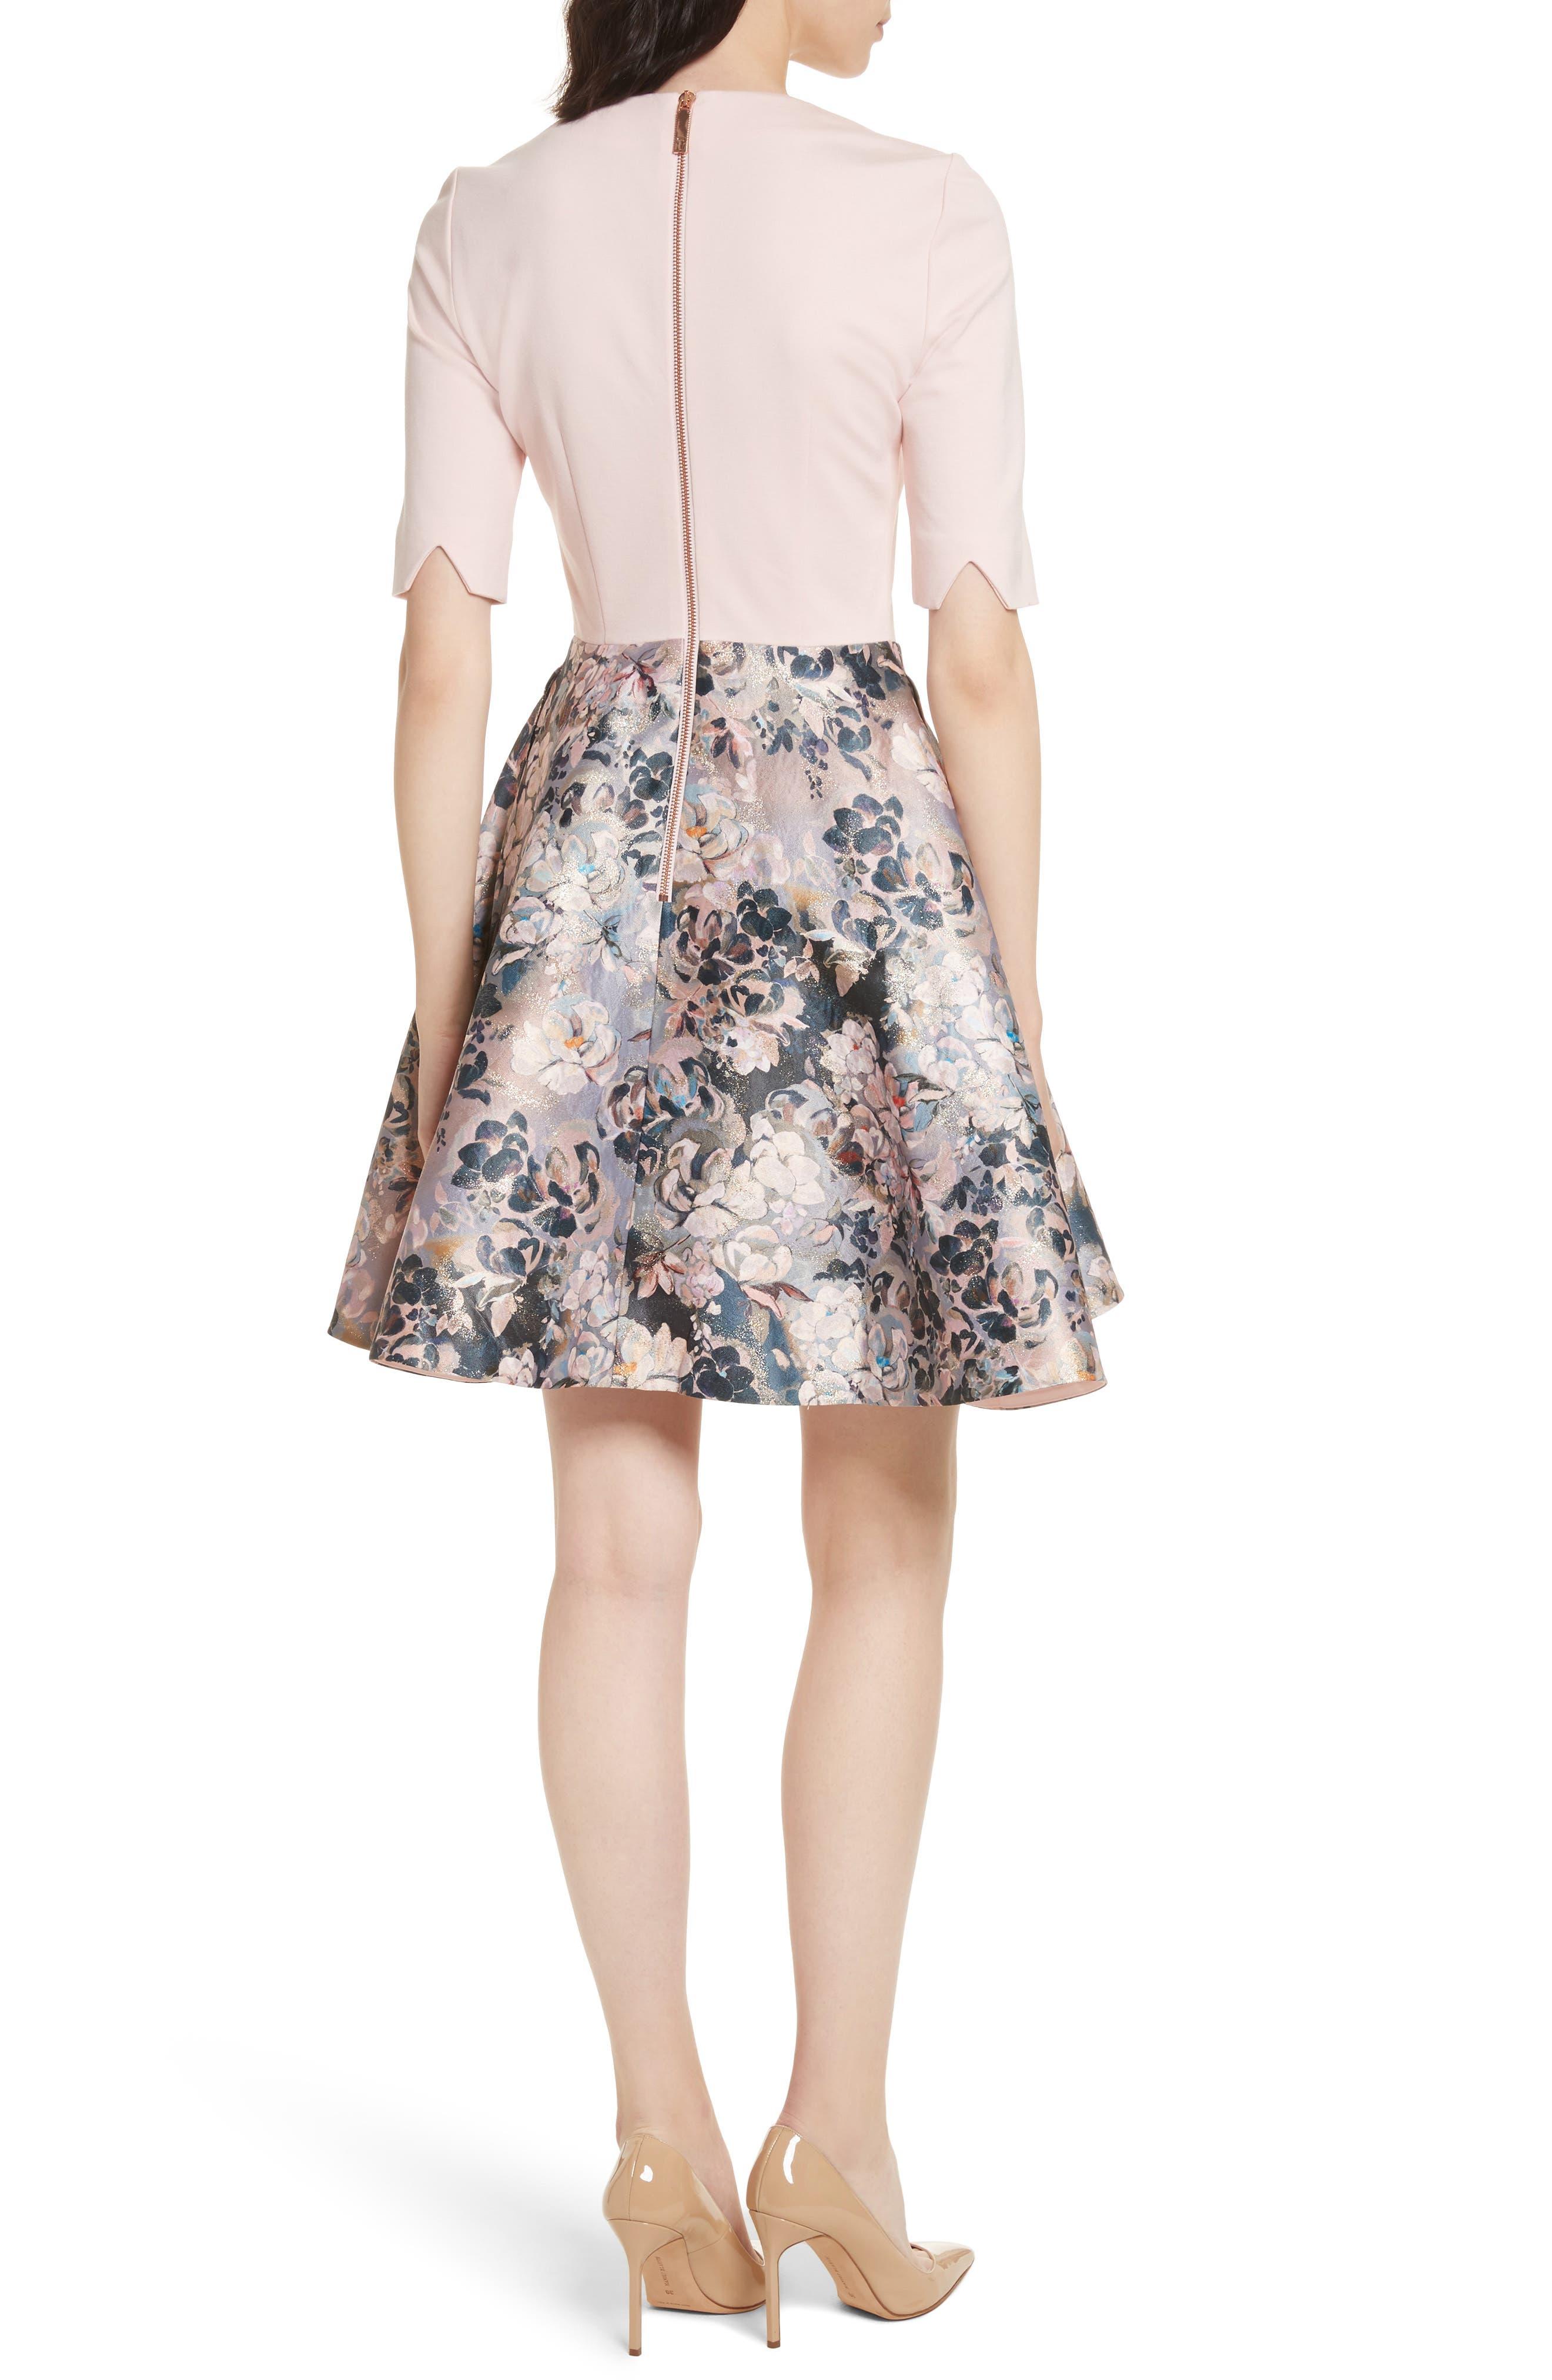 Eloquent Jacquard Skater Dress,                             Alternate thumbnail 2, color,                             Pale Pink